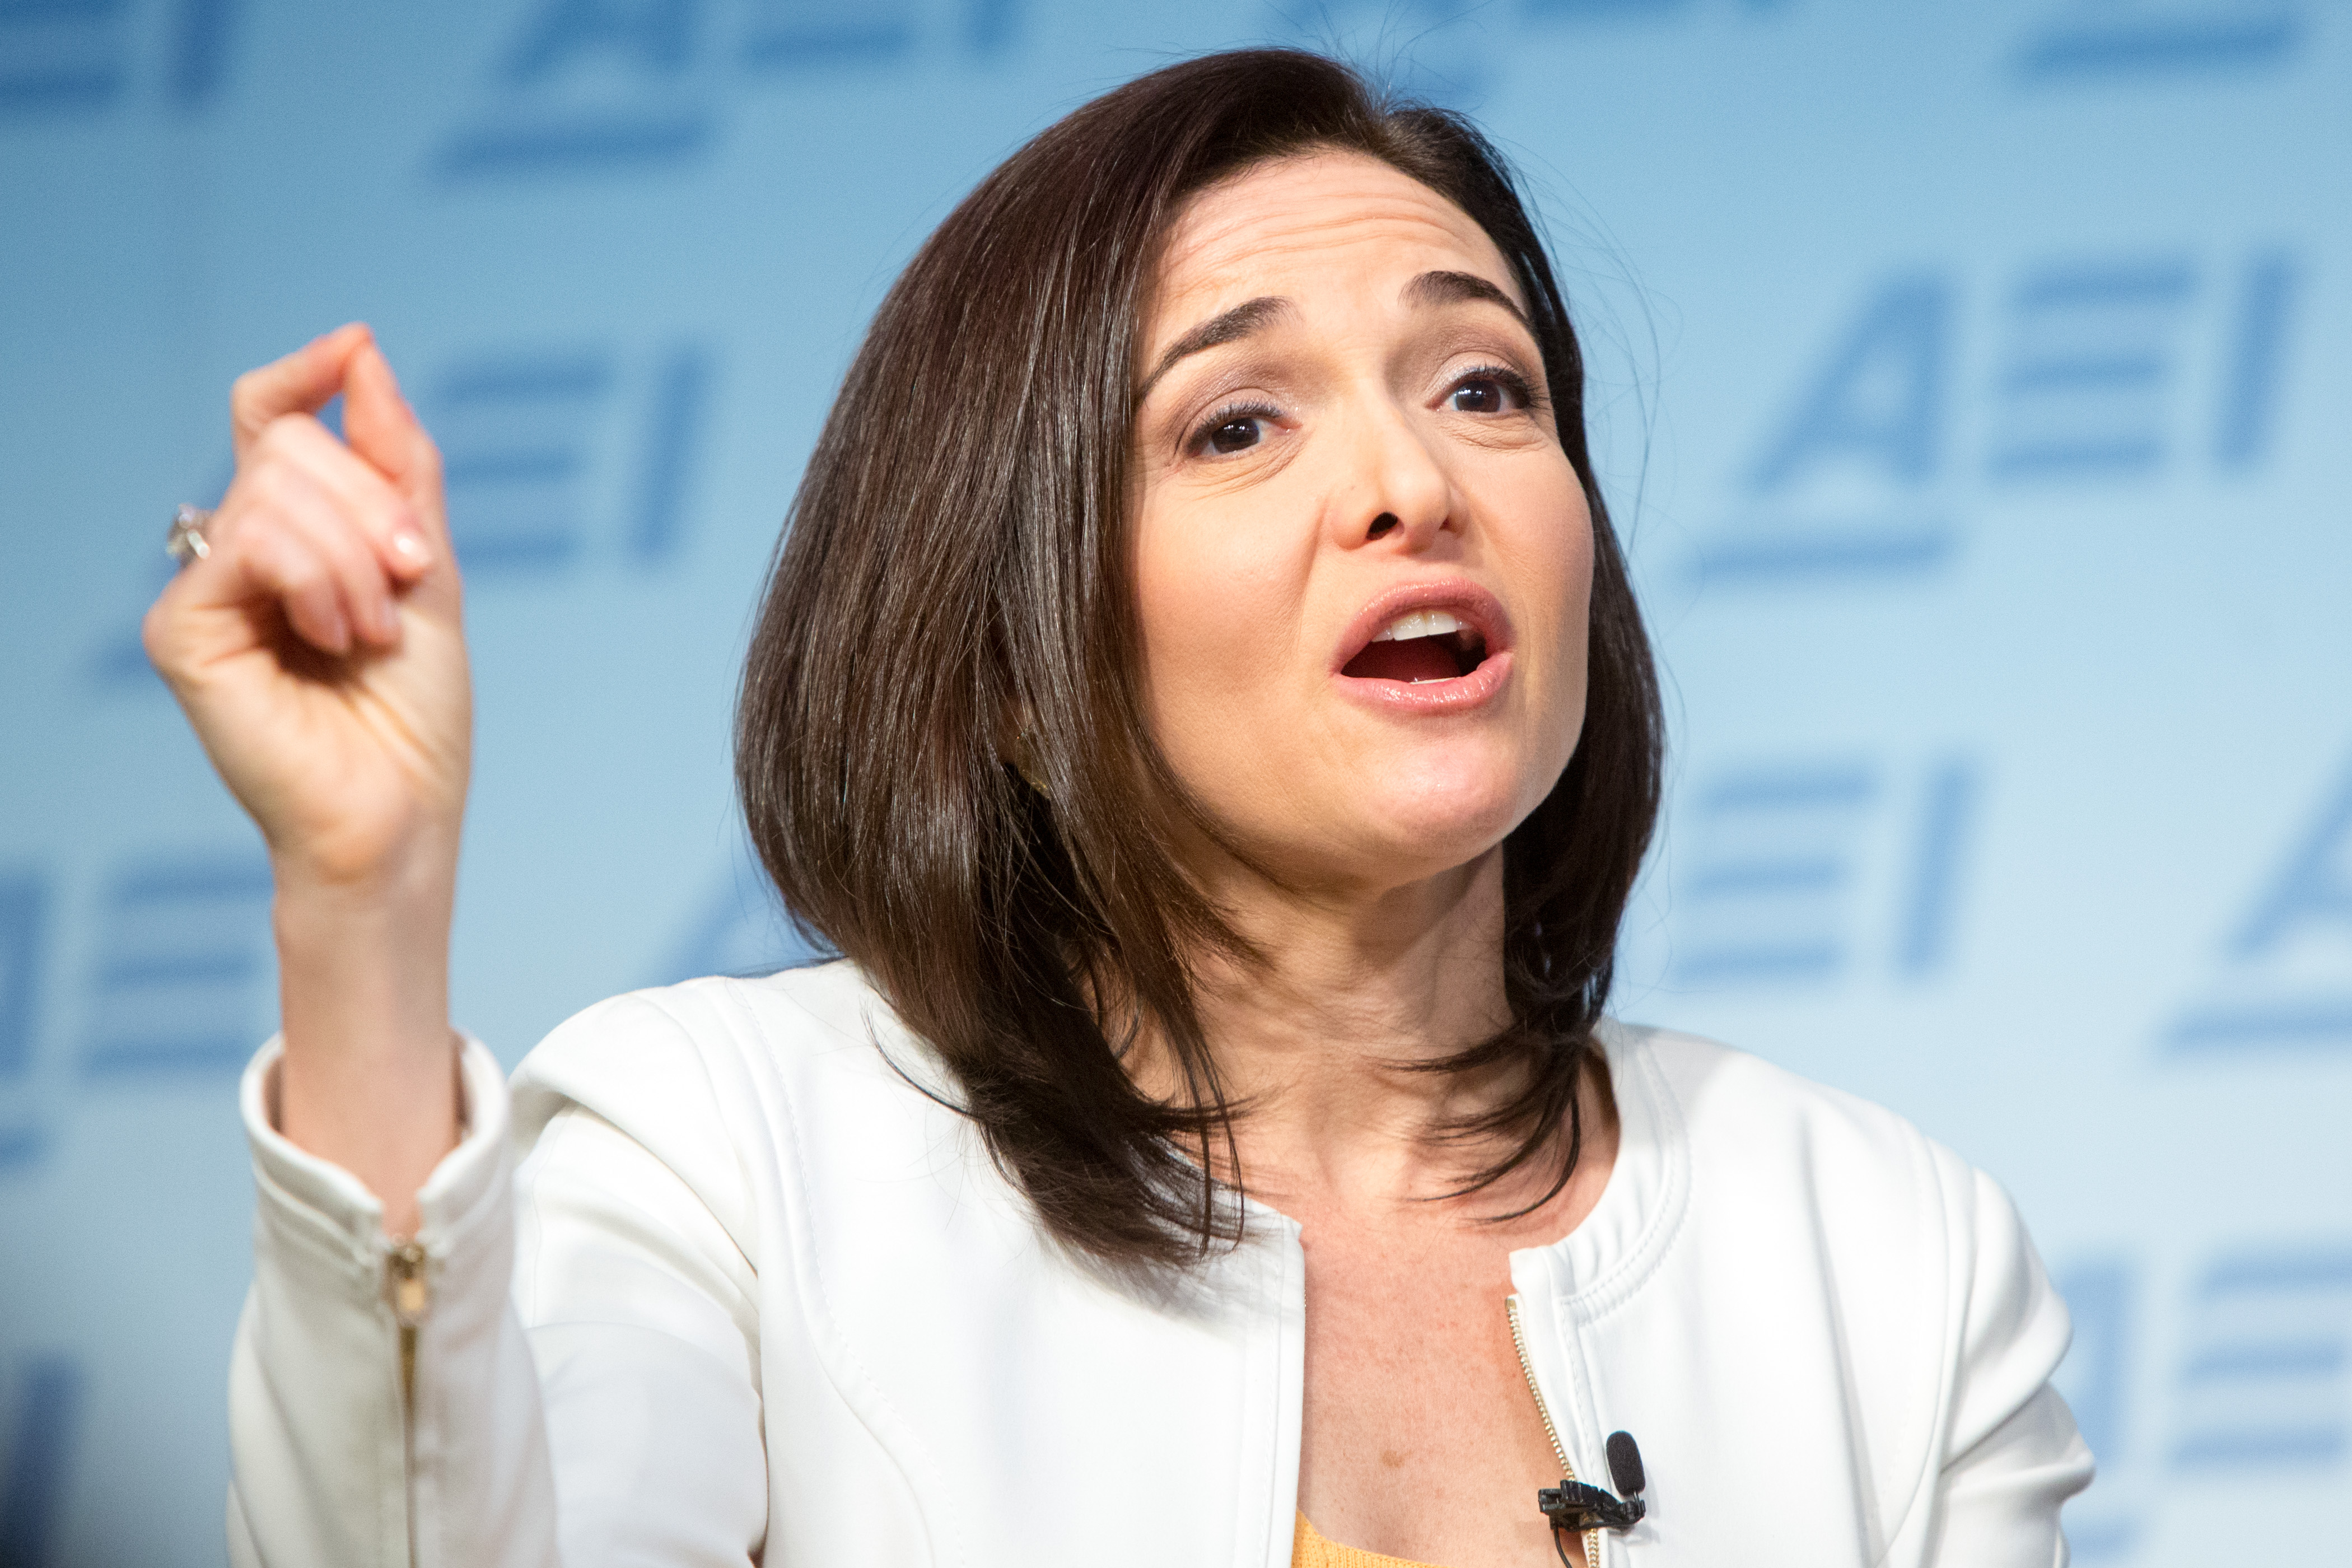 Facebook's Chief Operating Officer Sheryl Sandberg Speaks At The American Enterprise Institute In D.C.